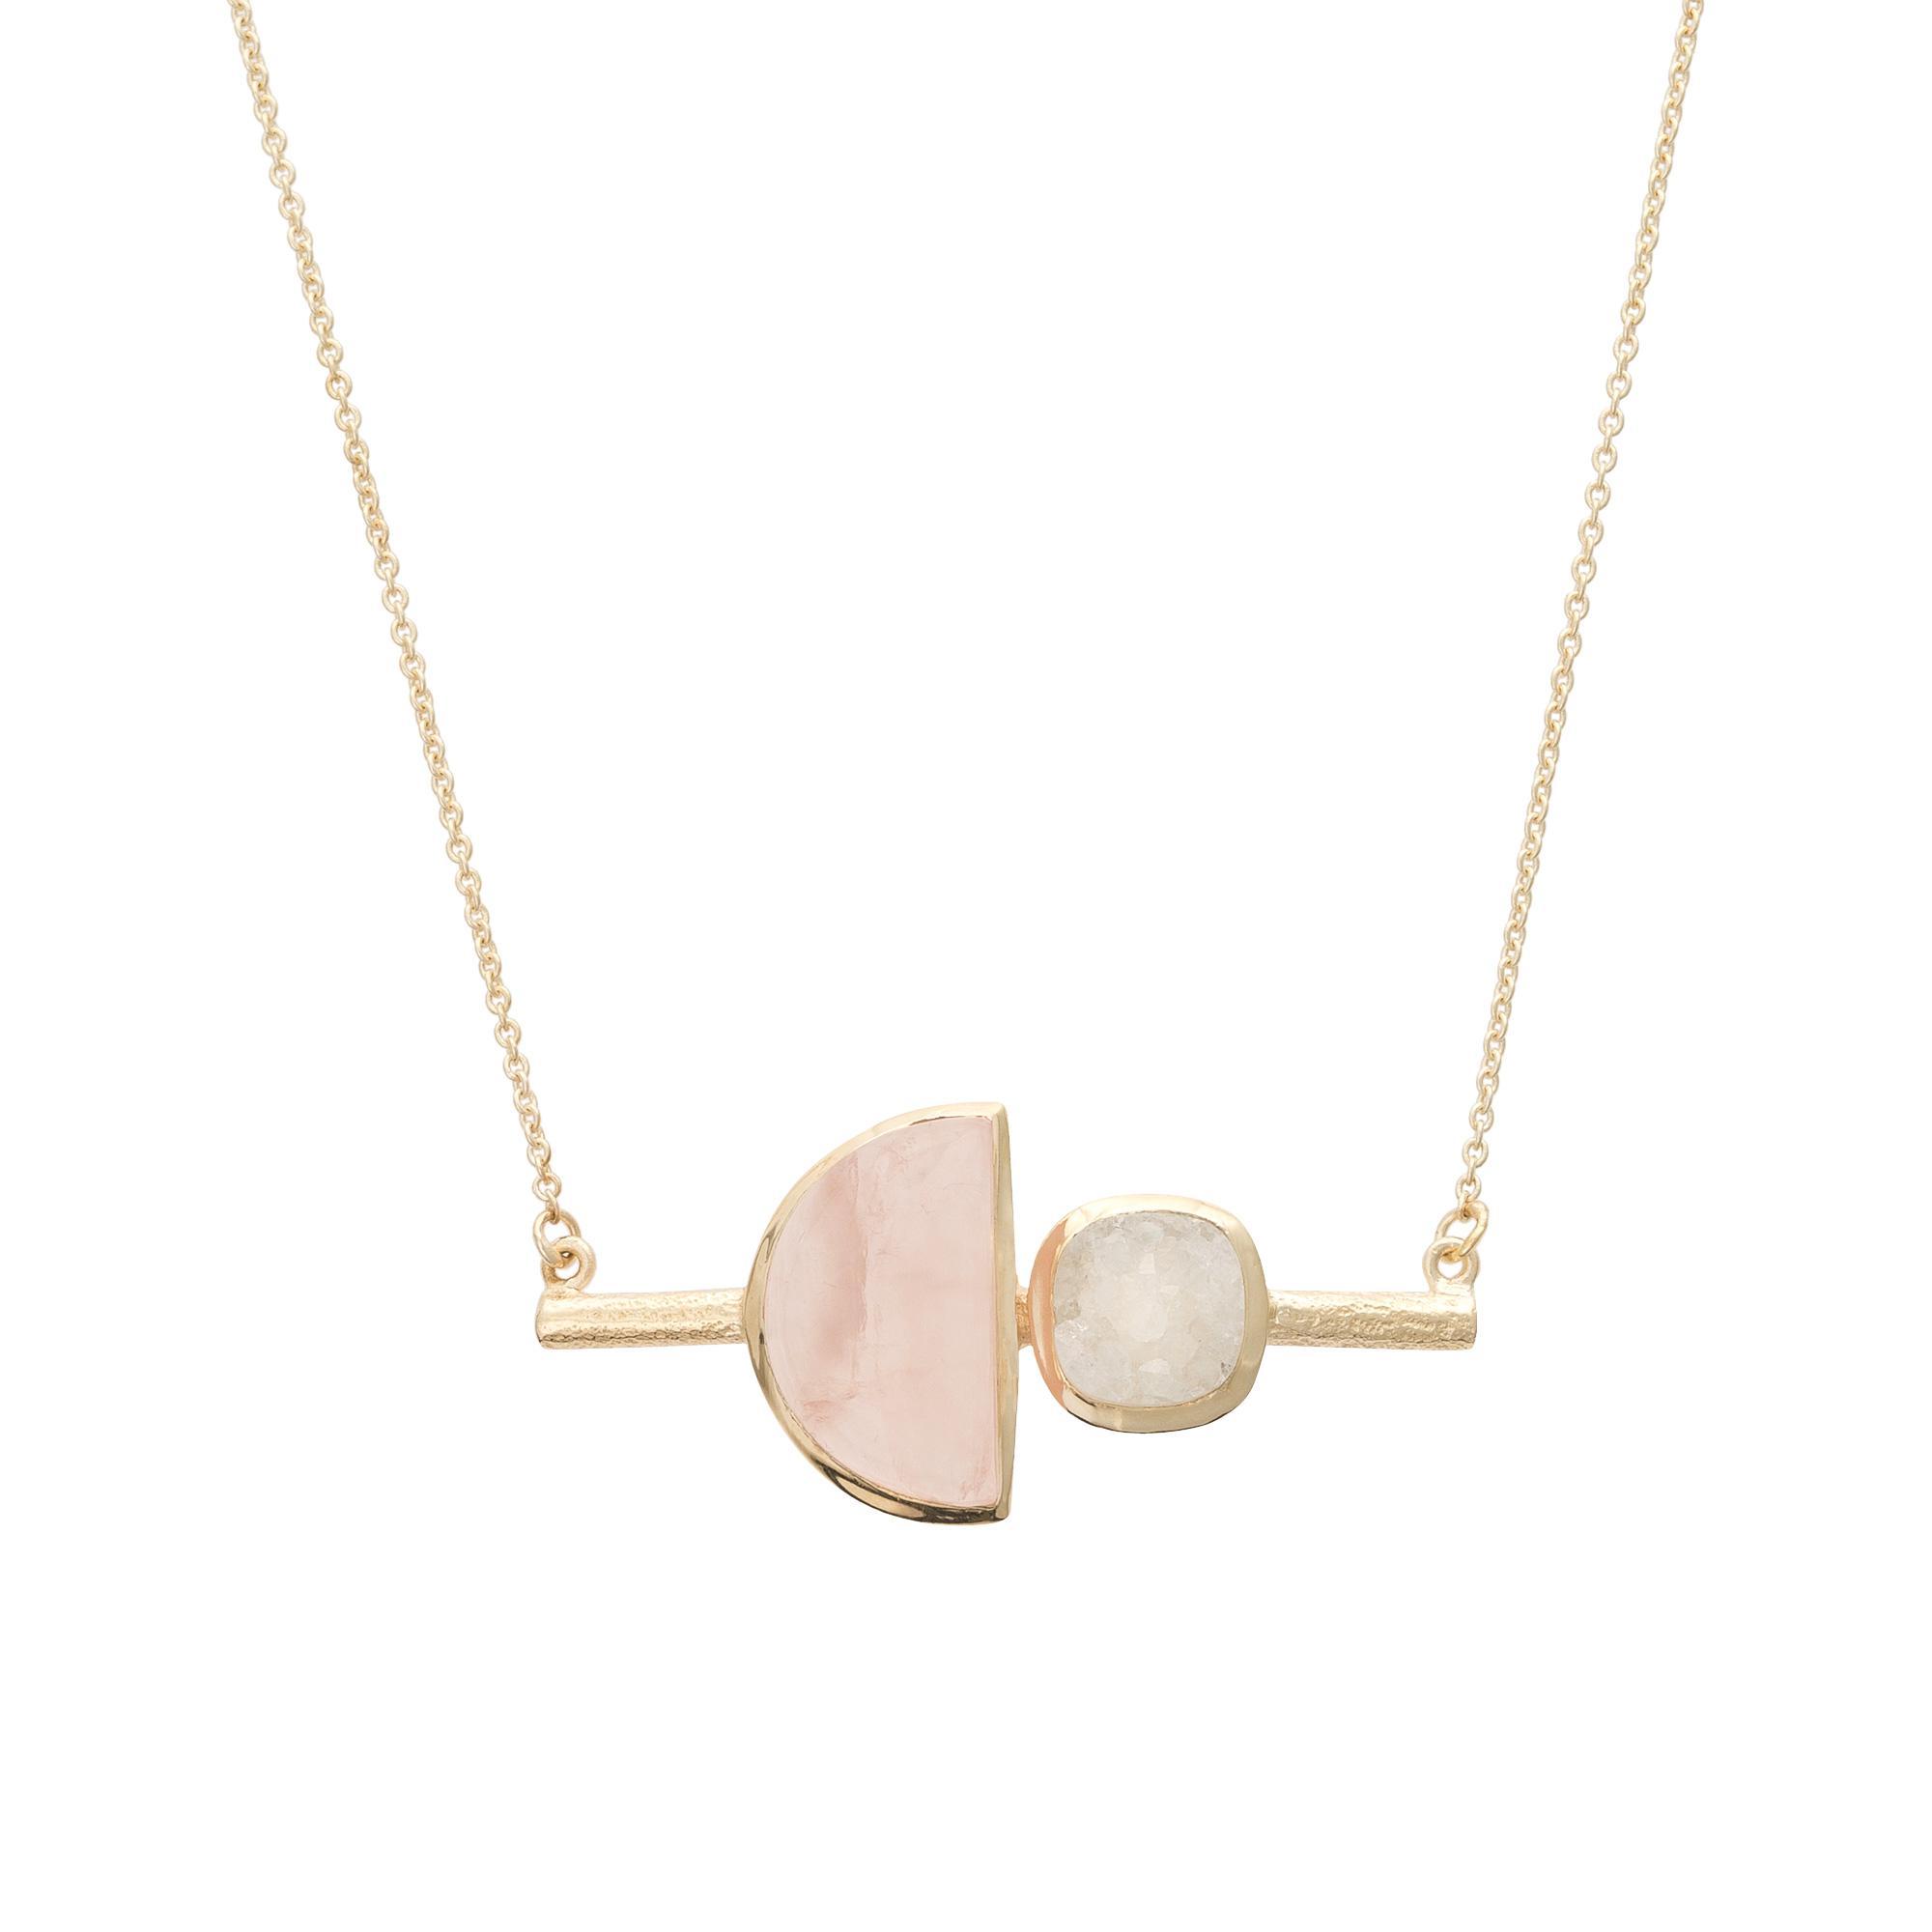 Lyst - Oliver Bonas Margo Semi Circle Stone & Druzy Necklace in Metallic